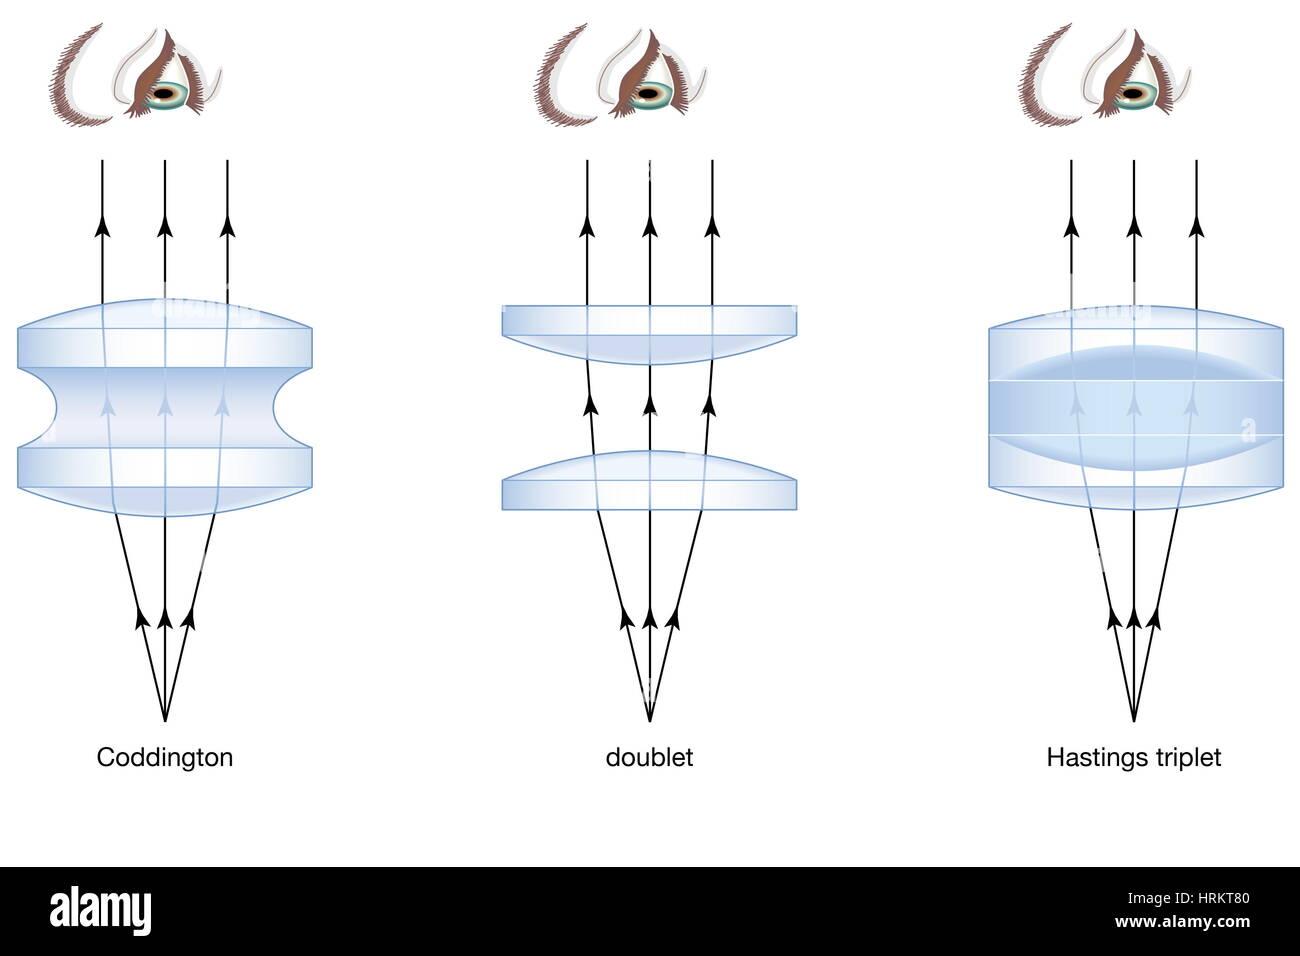 Tres formas de lupas, doblete, Coddington, Hastings triplet, microscopio, microscopía Imagen De Stock